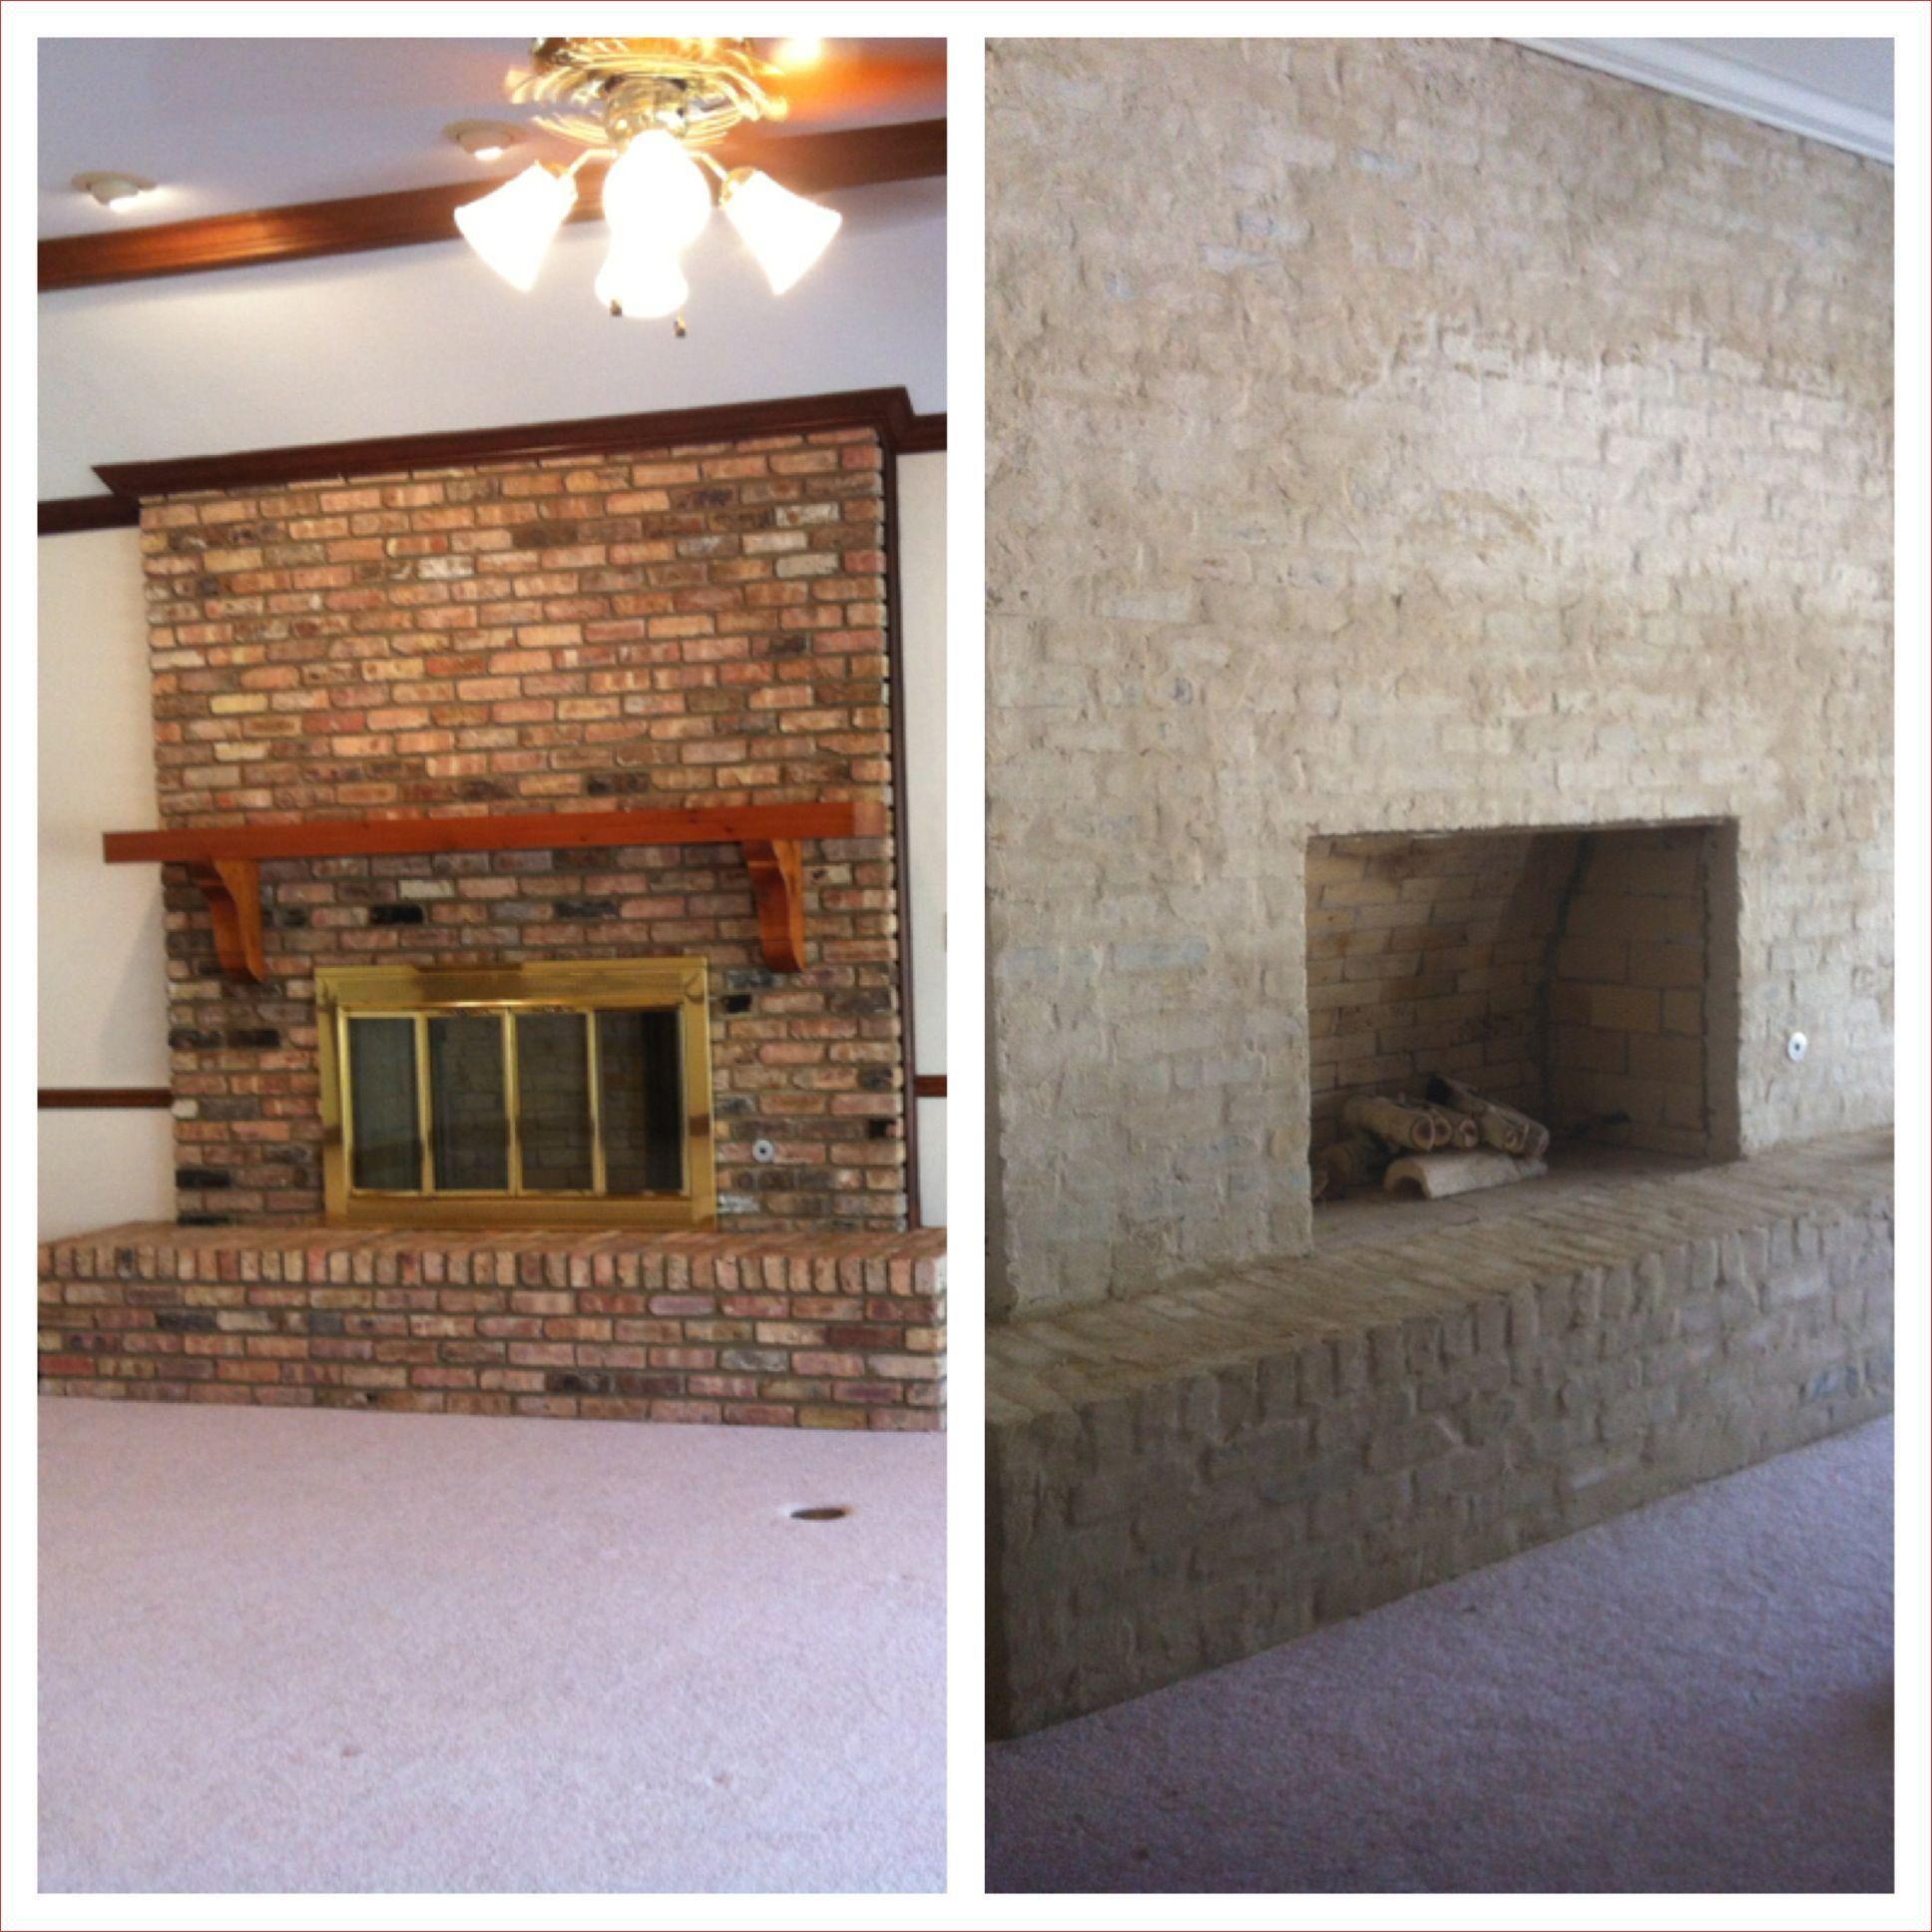 Lovely Diy Brick Fireplace Makeover Ideas Brick Fireplace Makeover Fireplace Makeover Fireplace